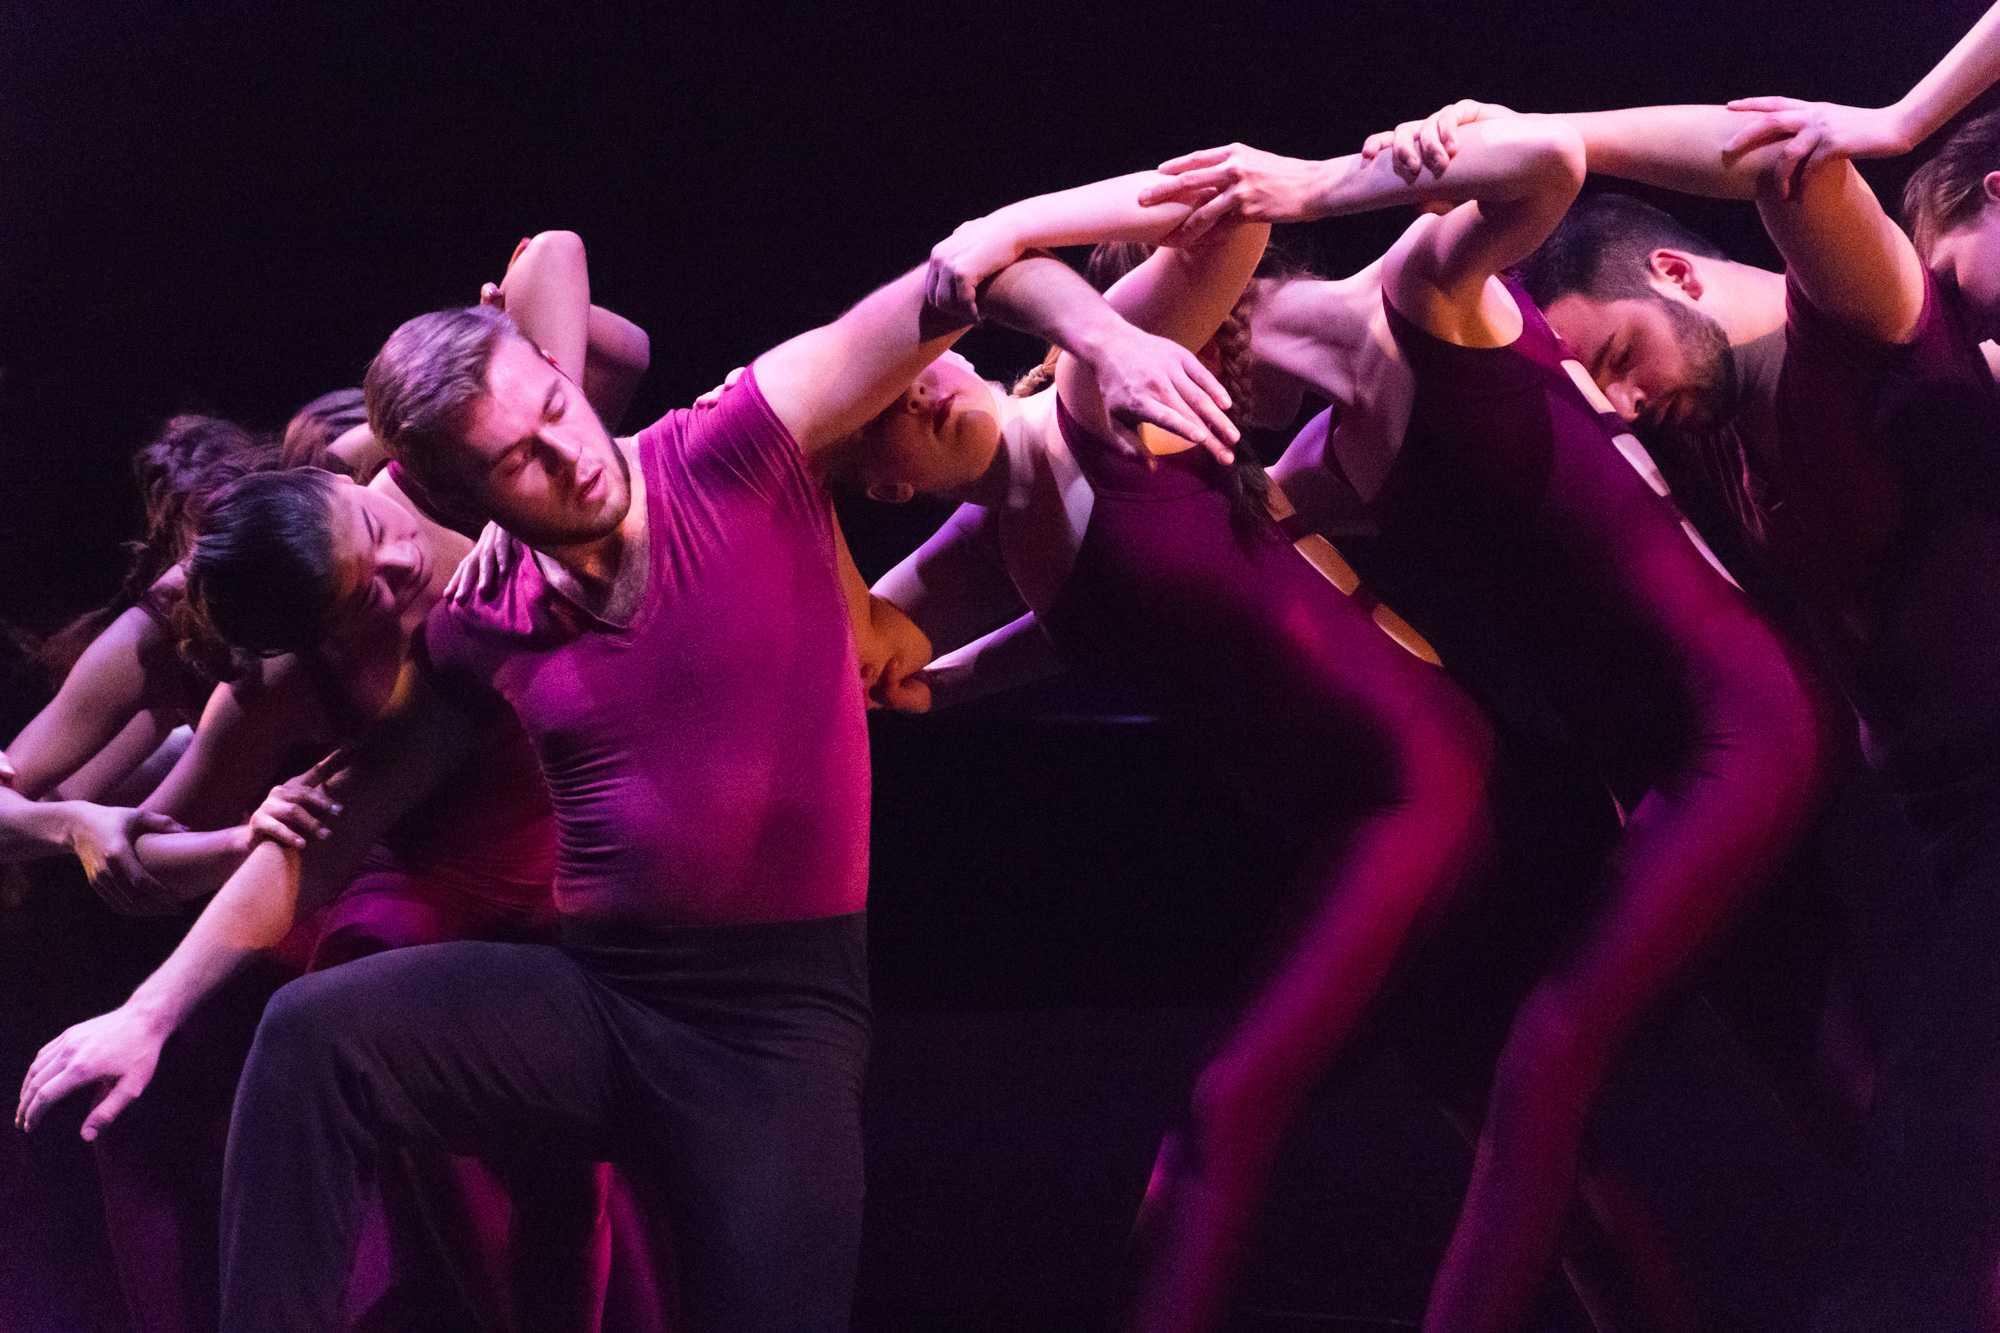 Dancer Lynton Martin performs senior lecturer and choreographer Regina Gulick's piece titled